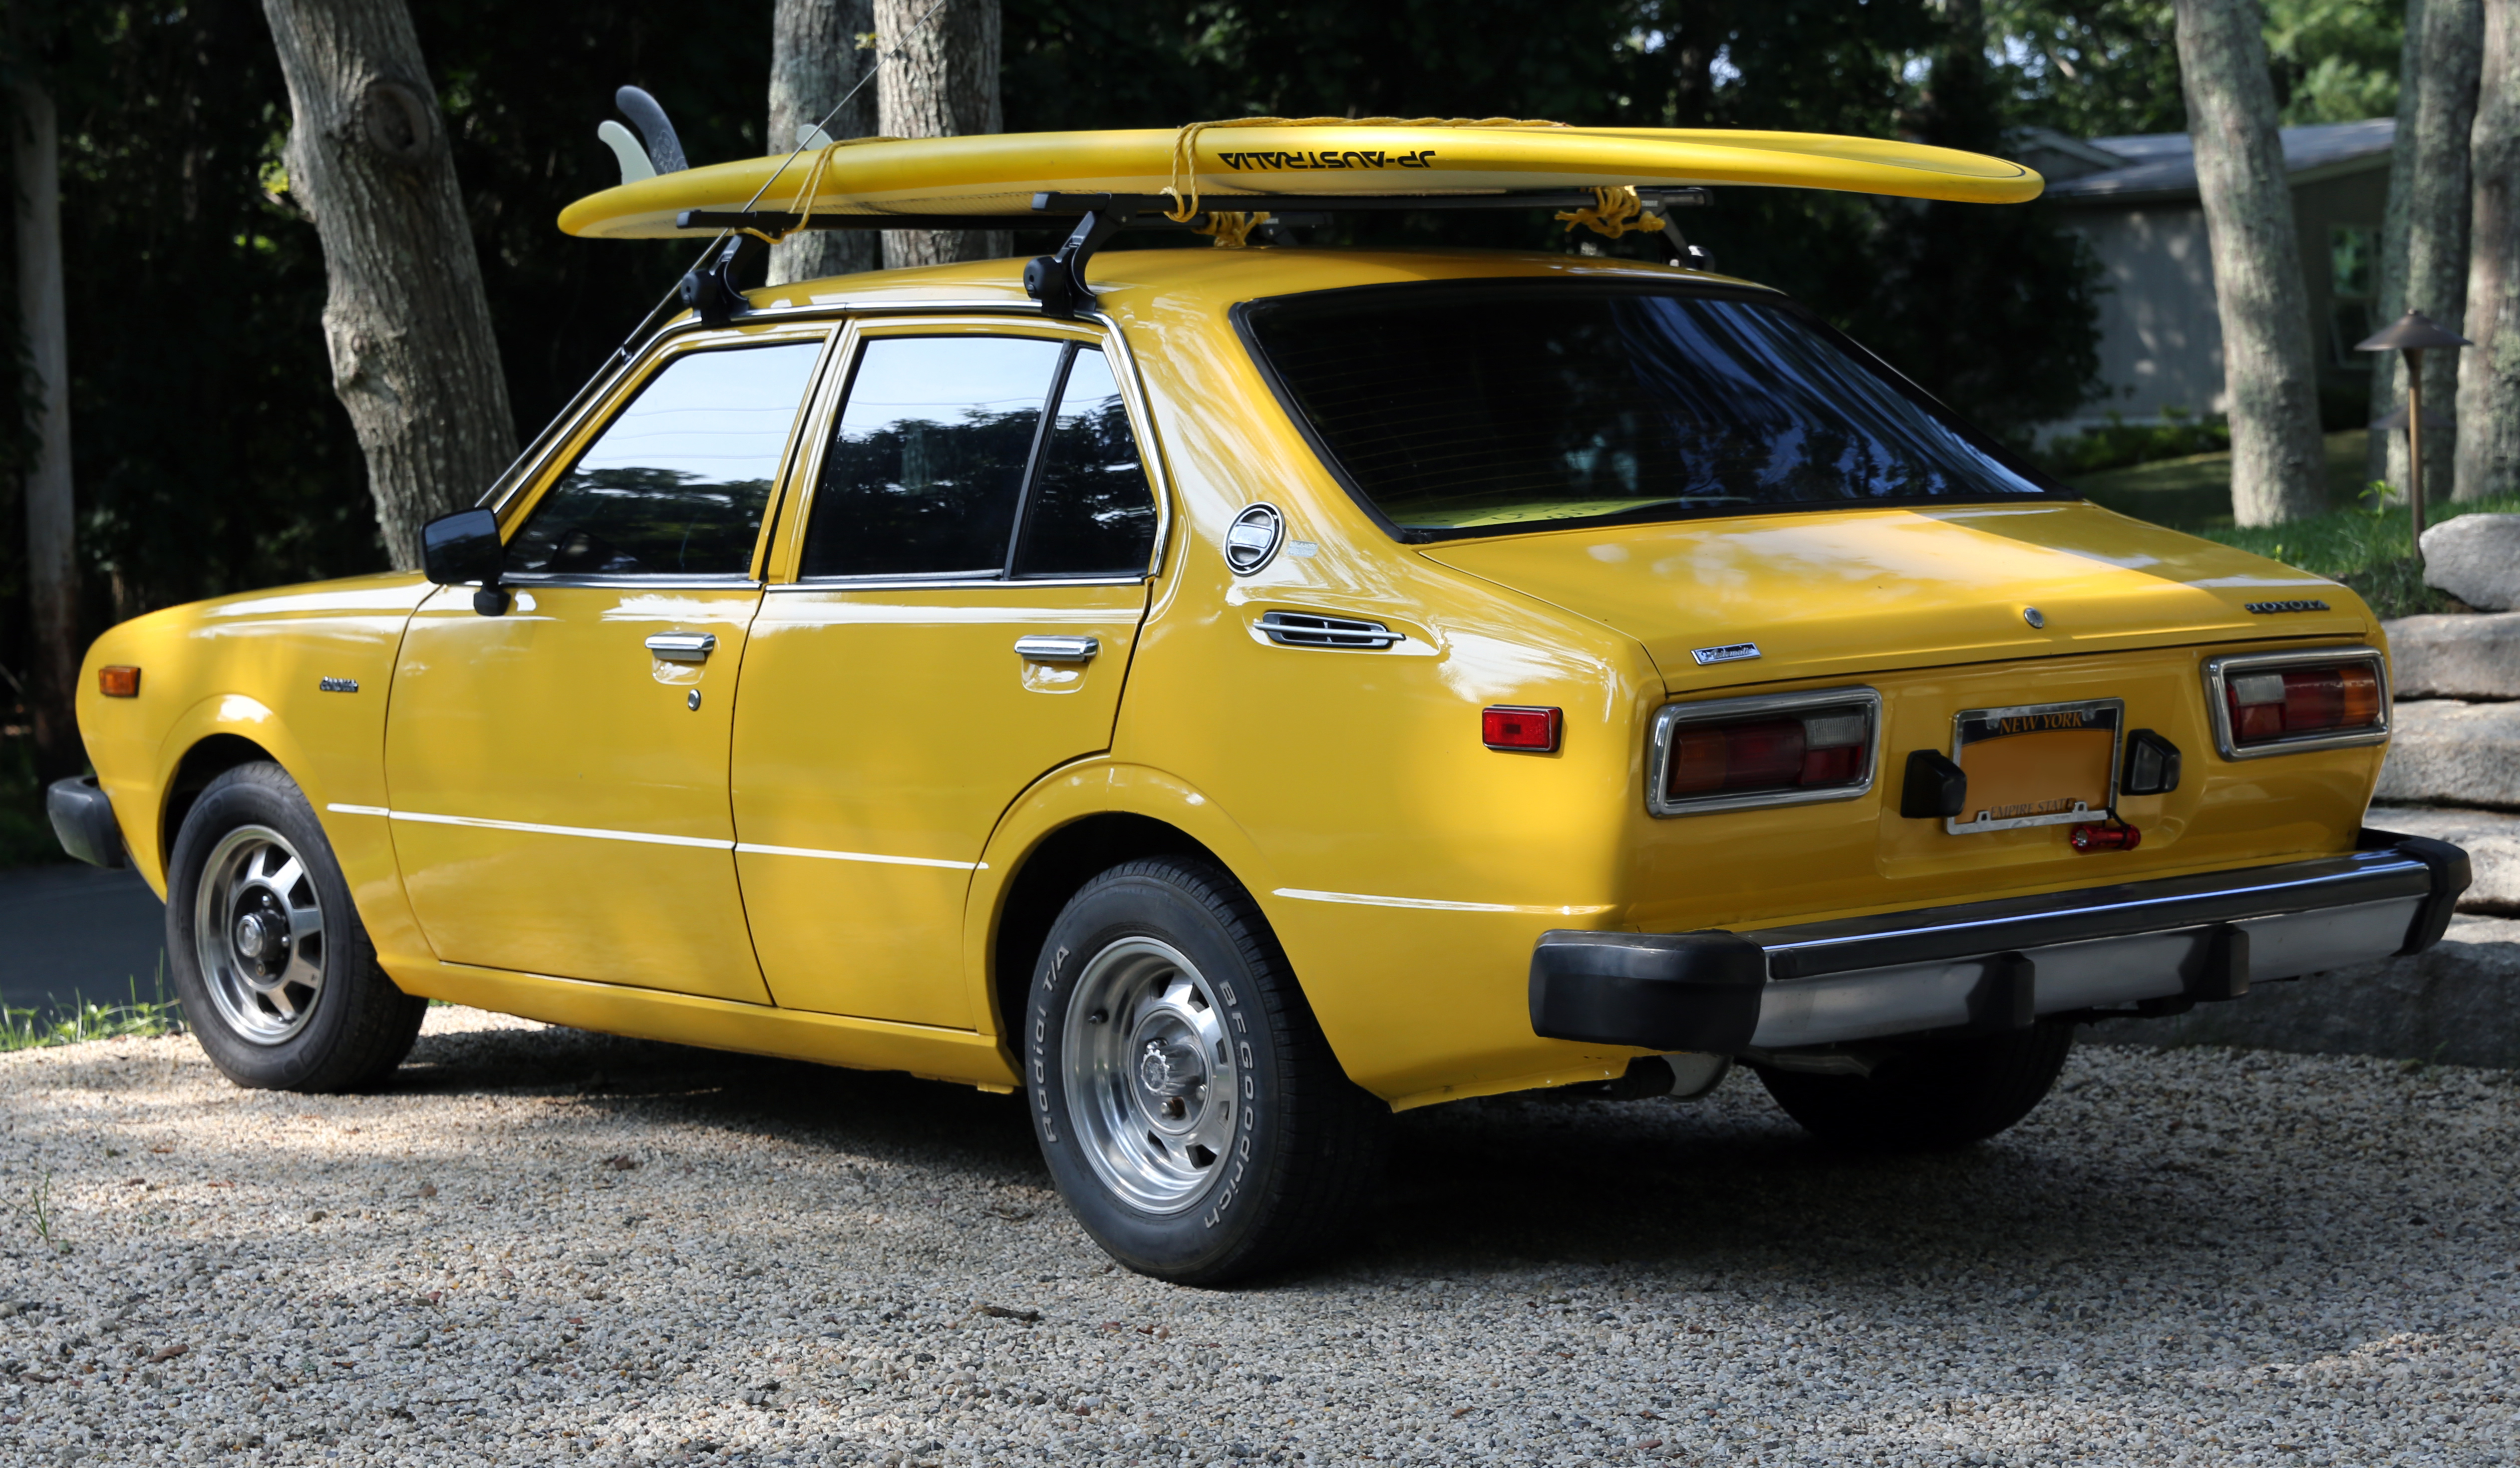 File:1978 Toyota Corolla (TE31) Special 4-door, rear.jpg